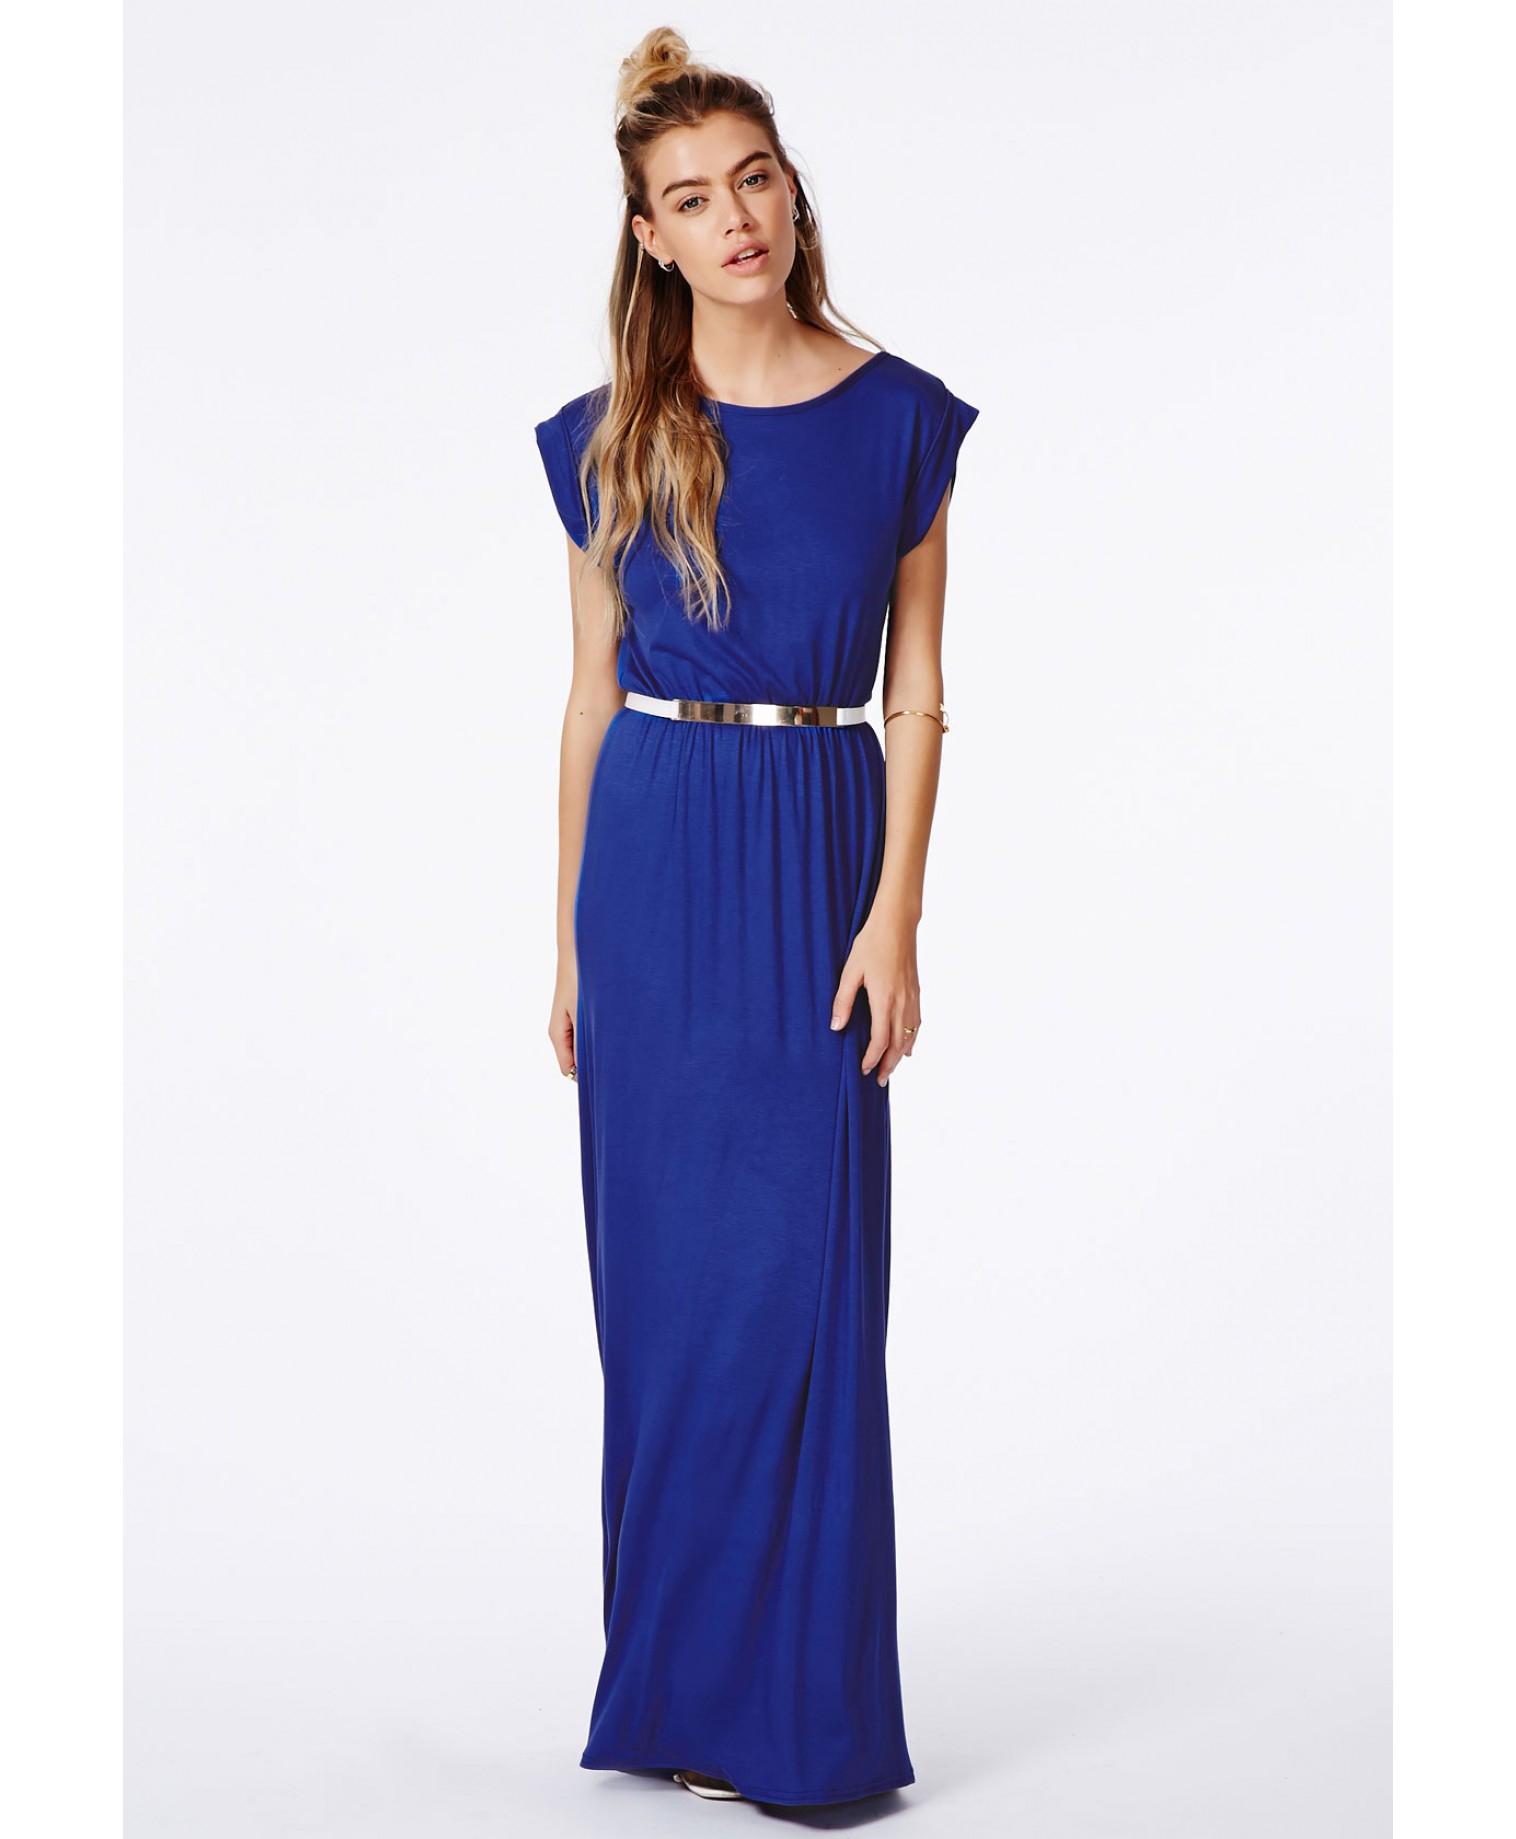 Missguided Abelie Cobalt Blue T-shirt Maxi Dress in Blue ...